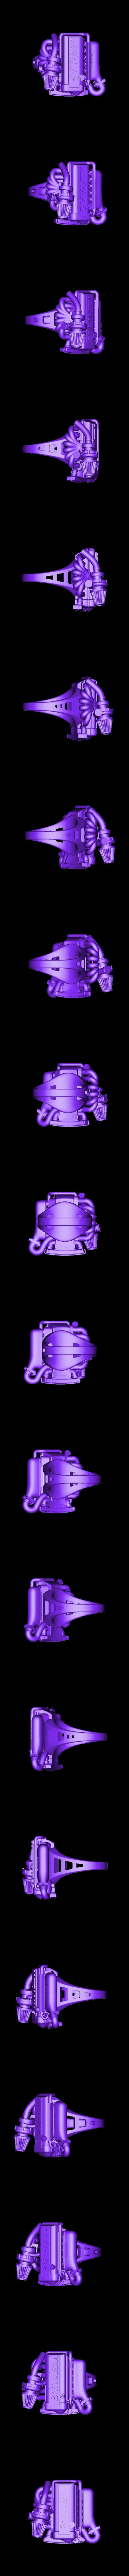 BMW ring engine ring mator ring.stl Télécharger fichier OBJ gratuit BMW ring moteur ring mator ring • Design pour imprimante 3D, Cadagency